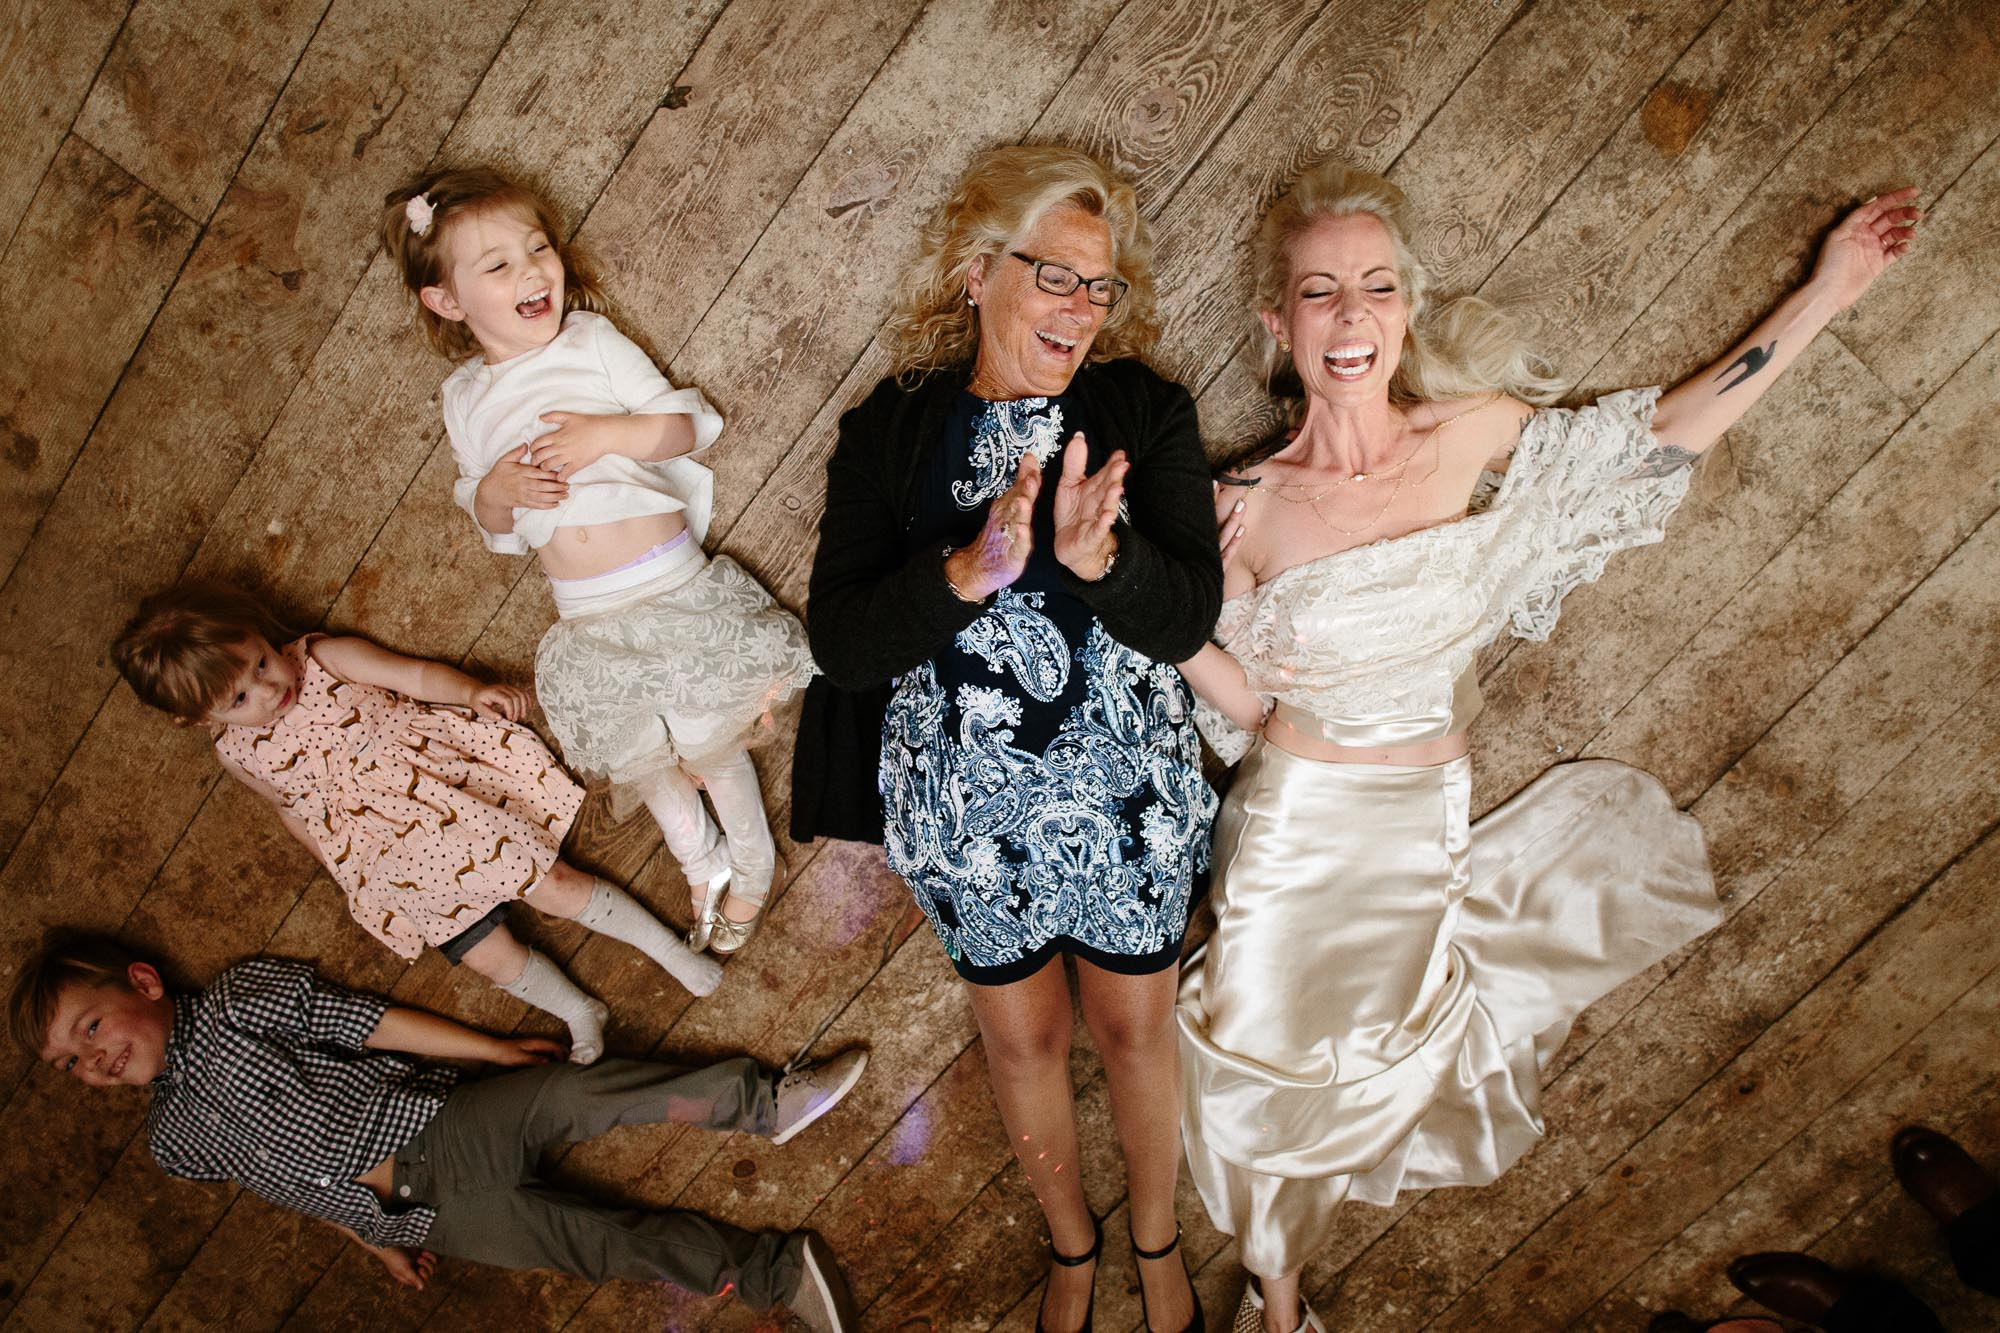 bucci-barn-wedding-elopement-evergreen-boulder-denver-colorado-adventerous-romantic-timeless-120.jpg